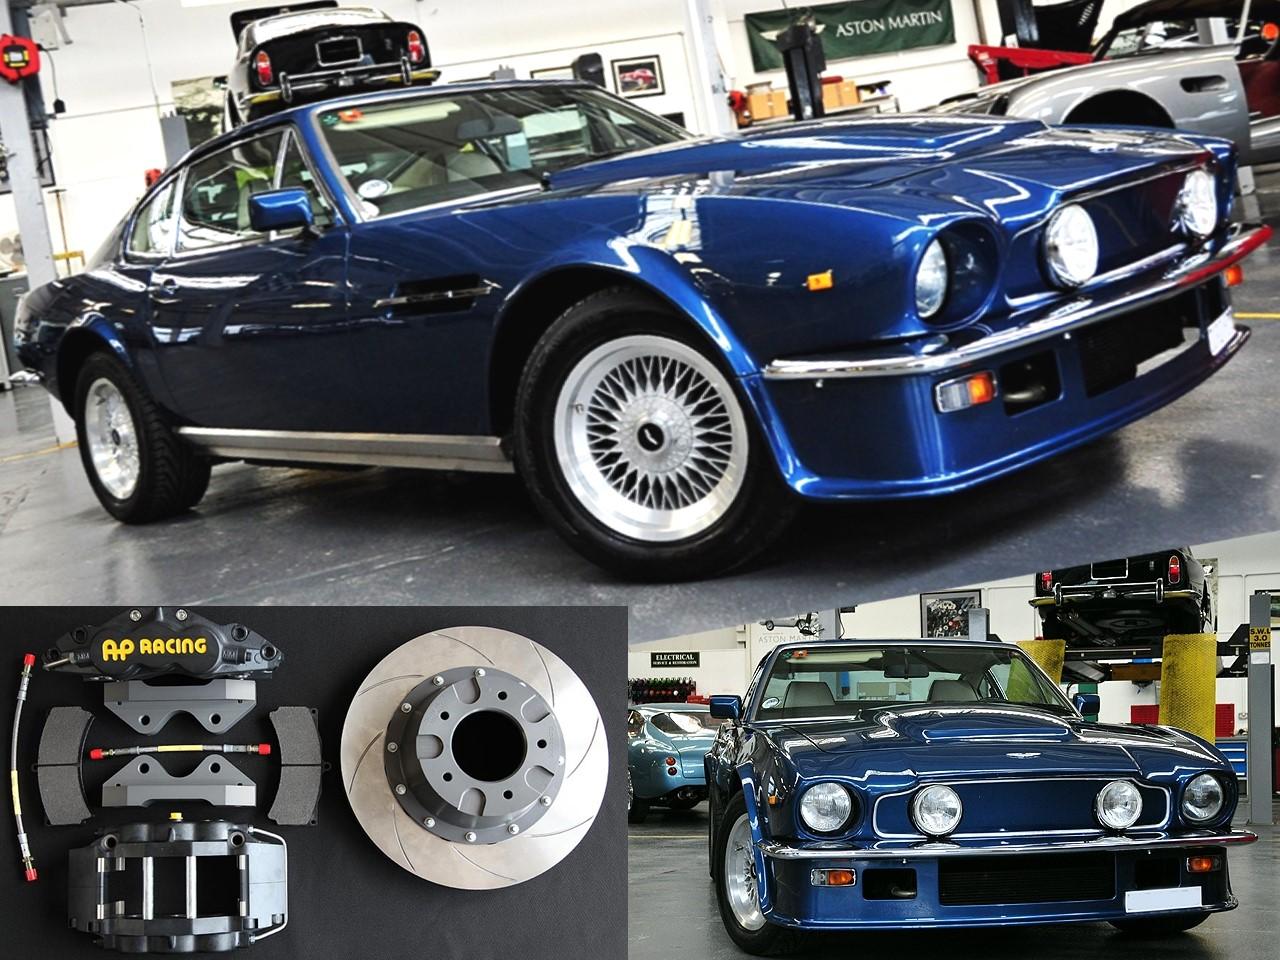 Retrospect Aston Martin V Vantage Volante NotoriousLuxury - 1986 aston martin vantage